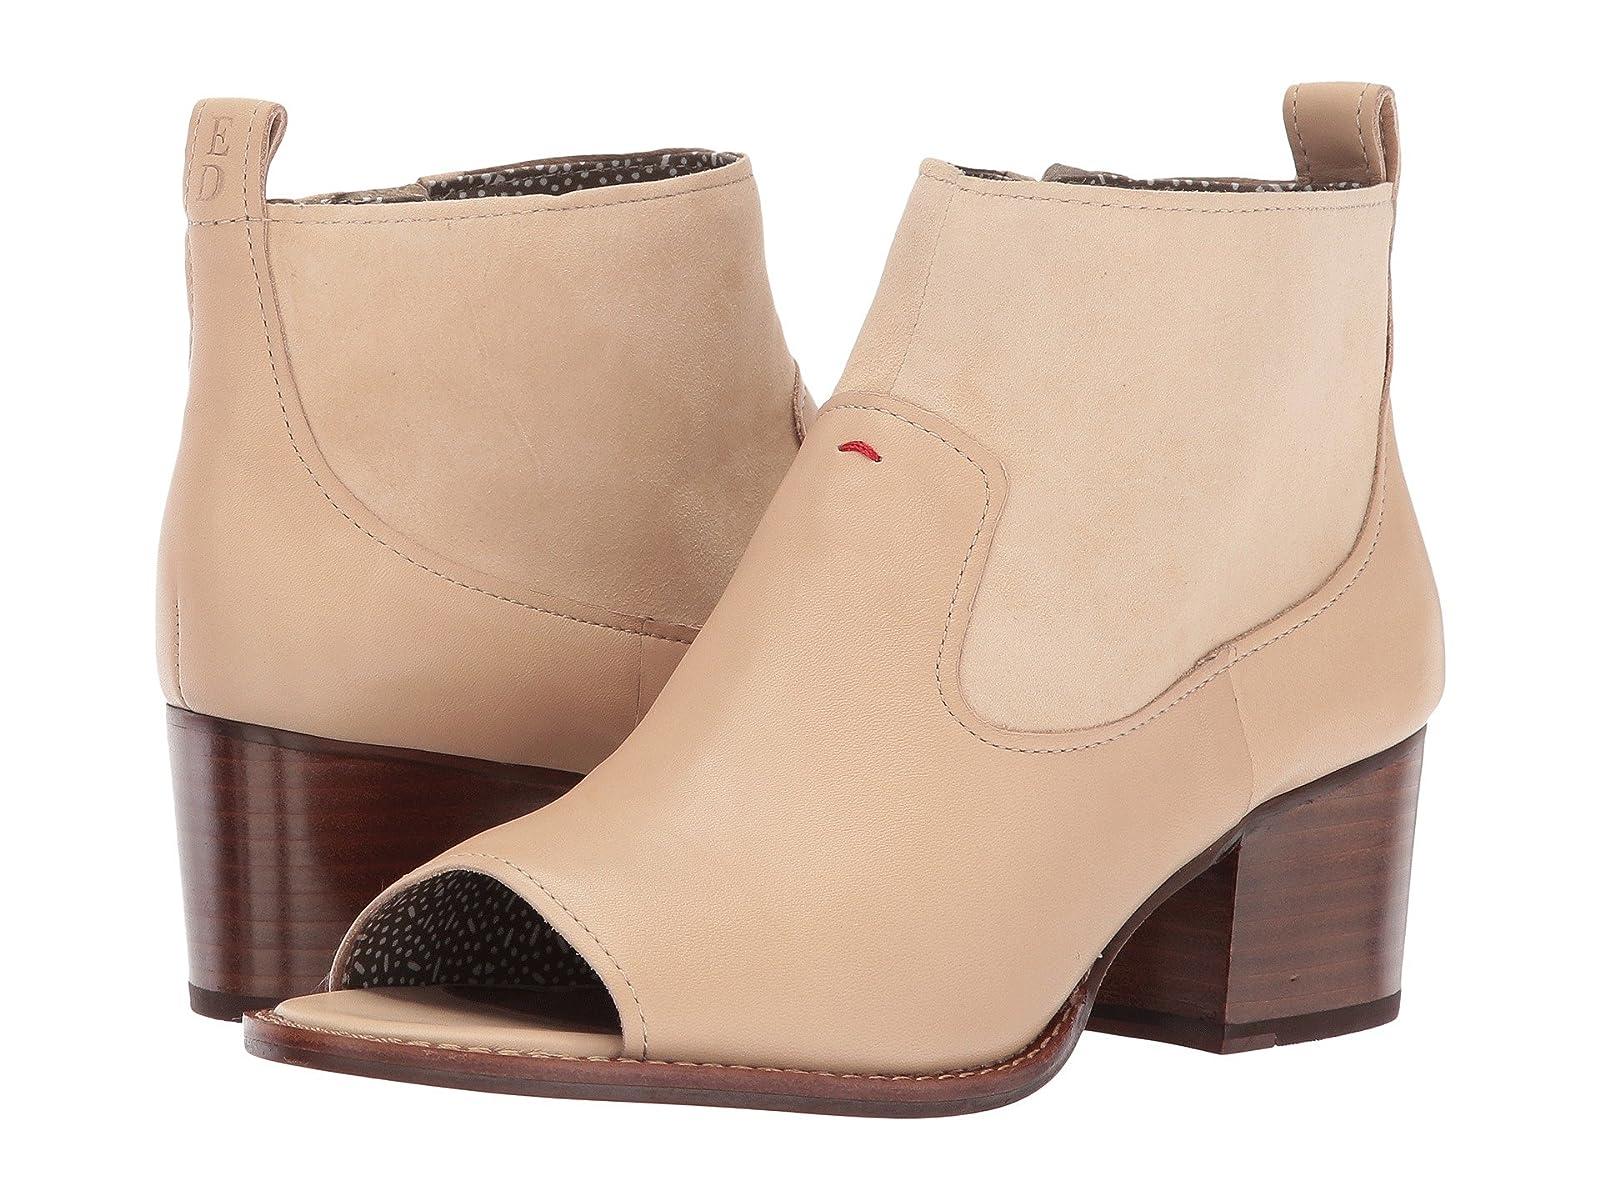 ED Ellen DeGeneres TraisonCheap and distinctive eye-catching shoes